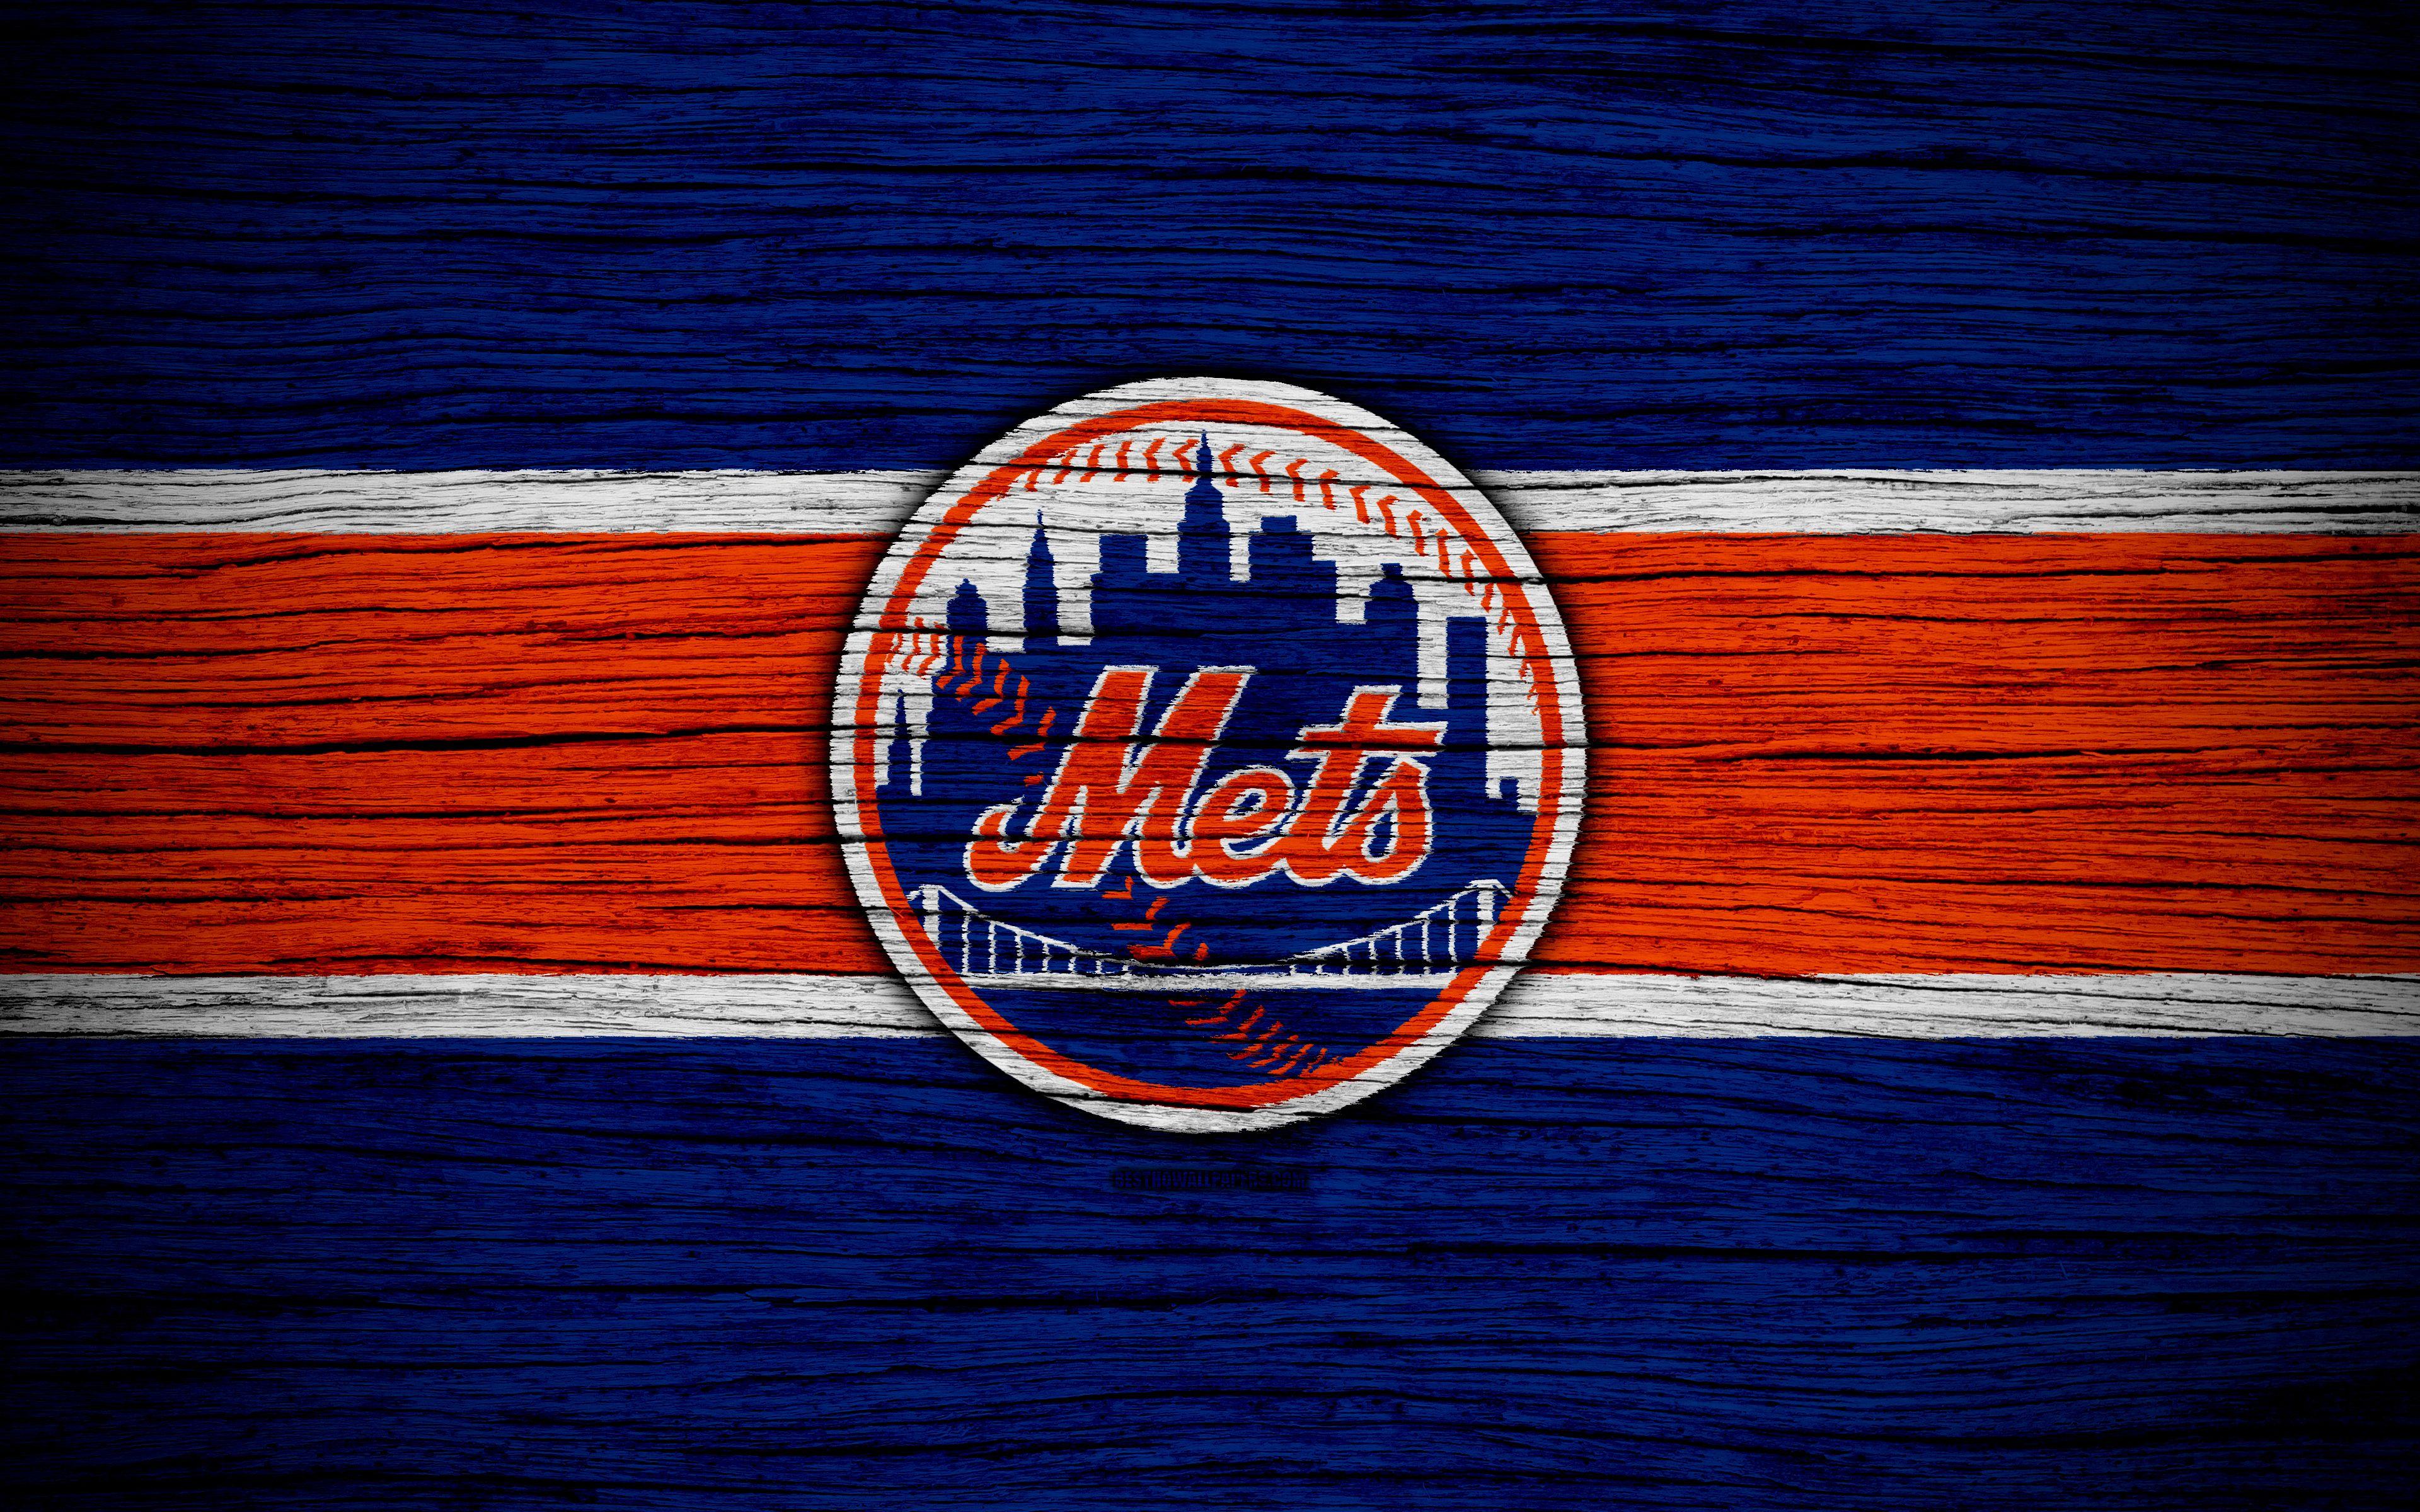 New York Mets Wallpaper: NY Mets Wallpapers